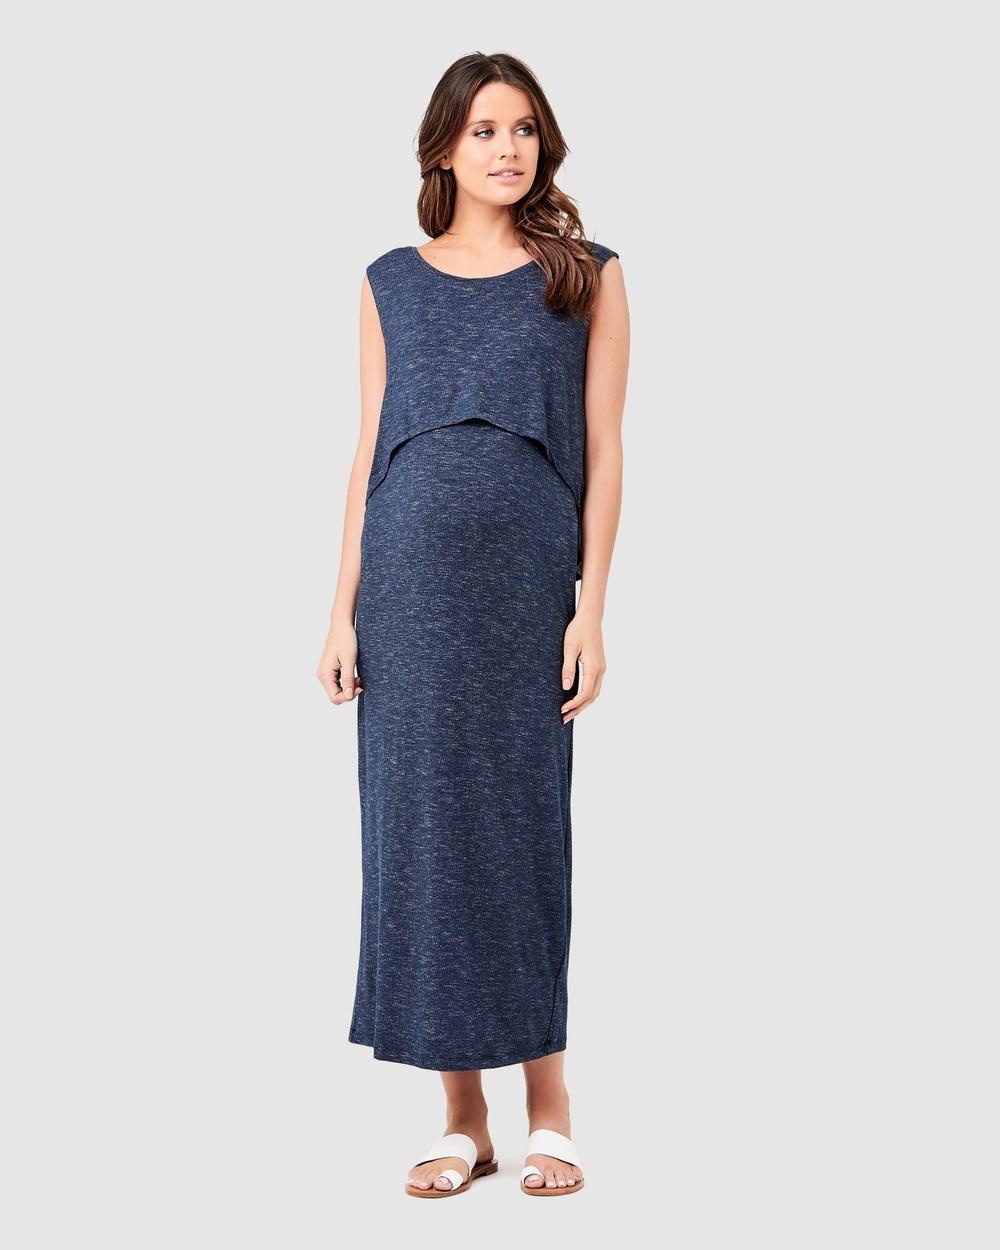 Ripe Maternity Swing Back Maxi Nursing Dress Dresses Denim Swing Back Maxi Nursing Dress